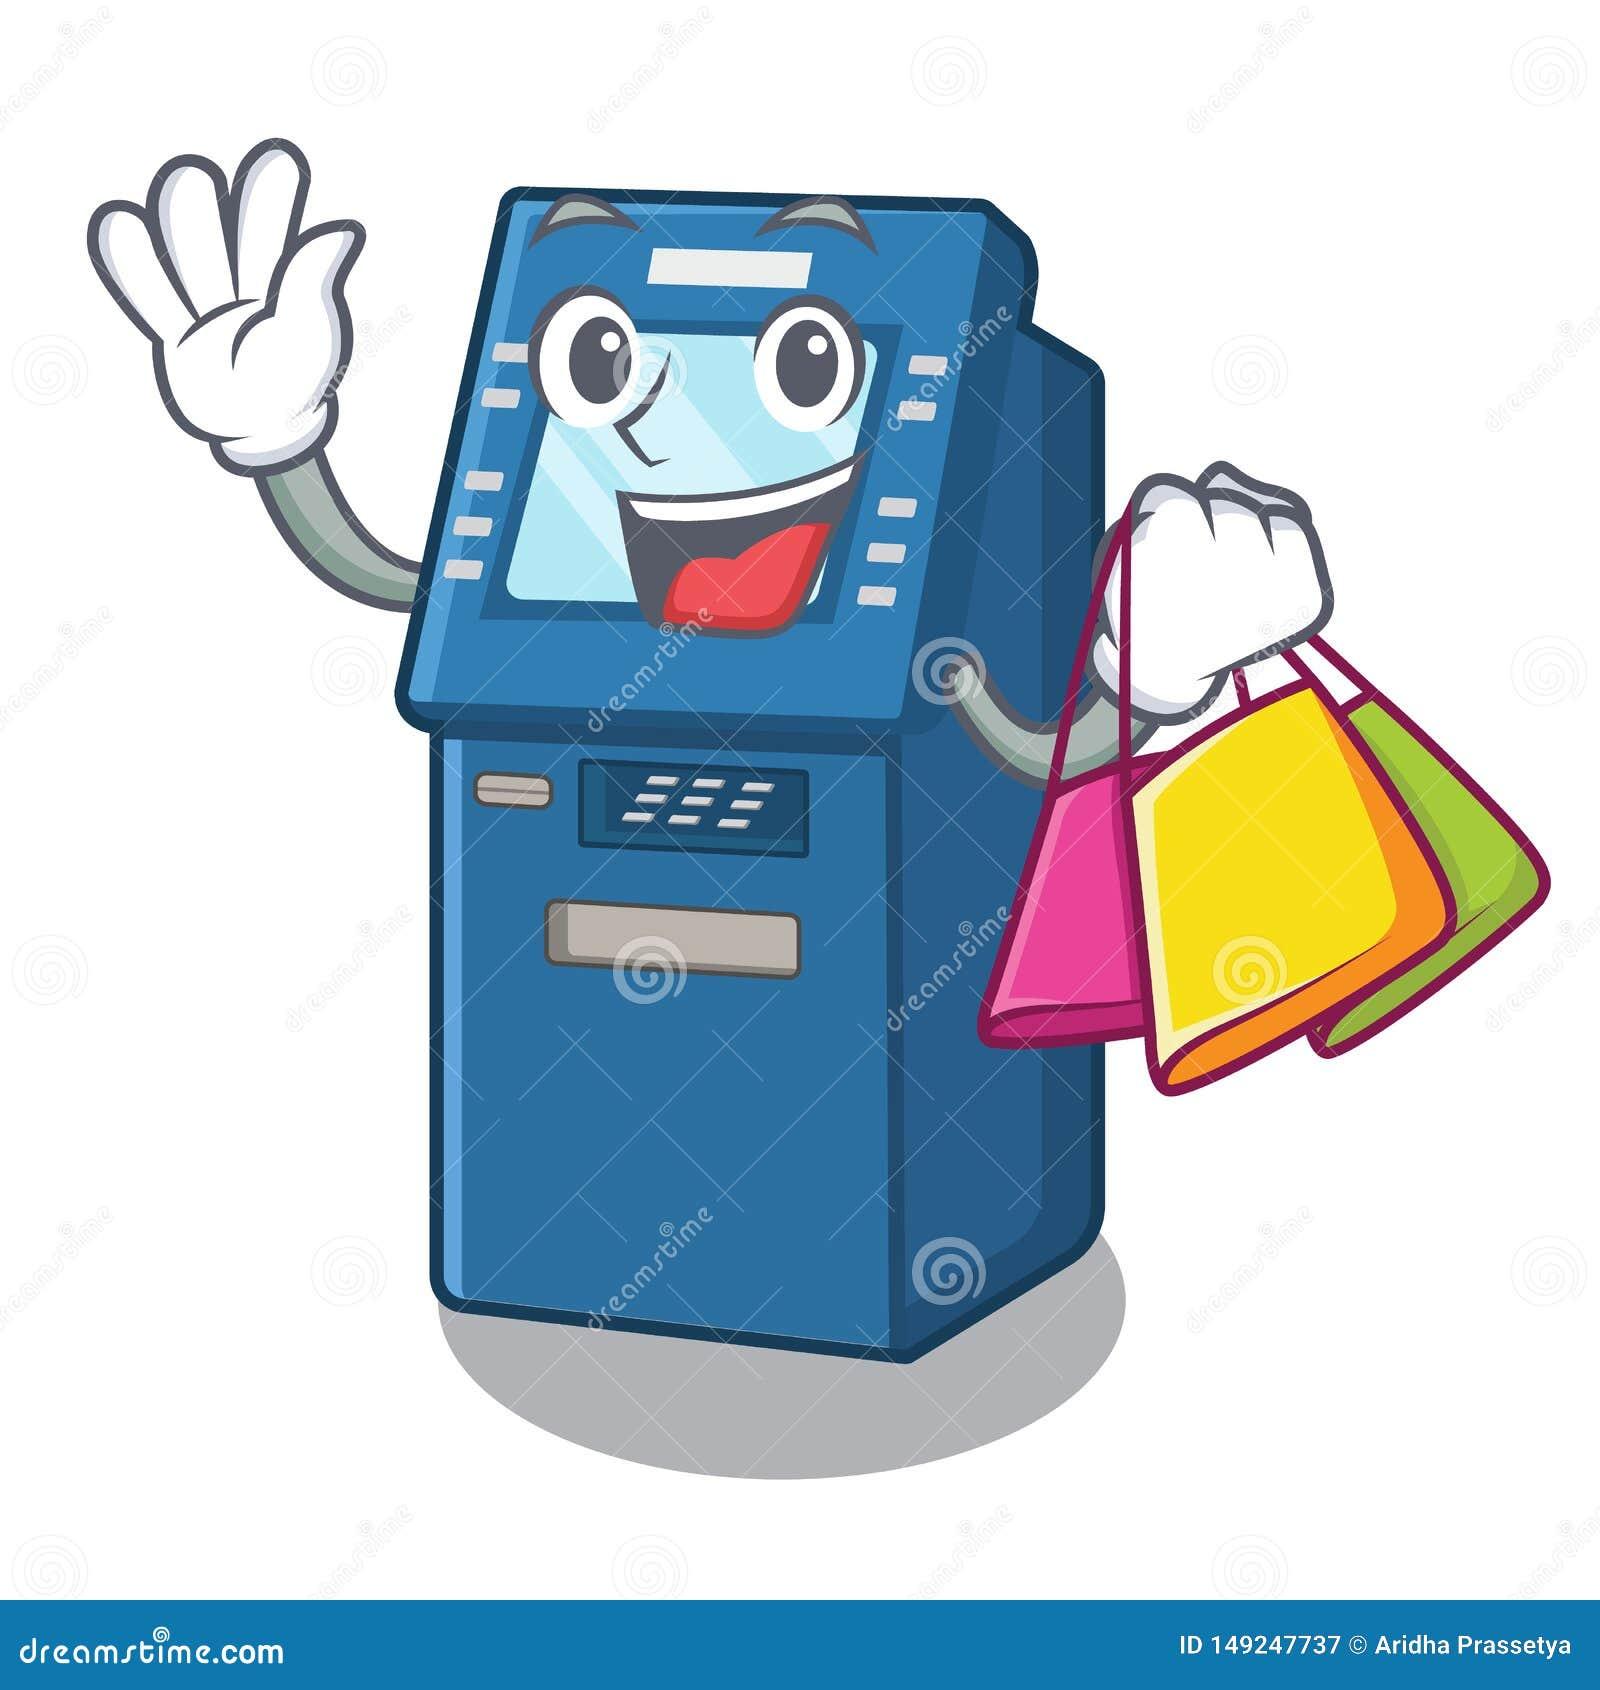 Shopping ATM machine in the cartoon shape